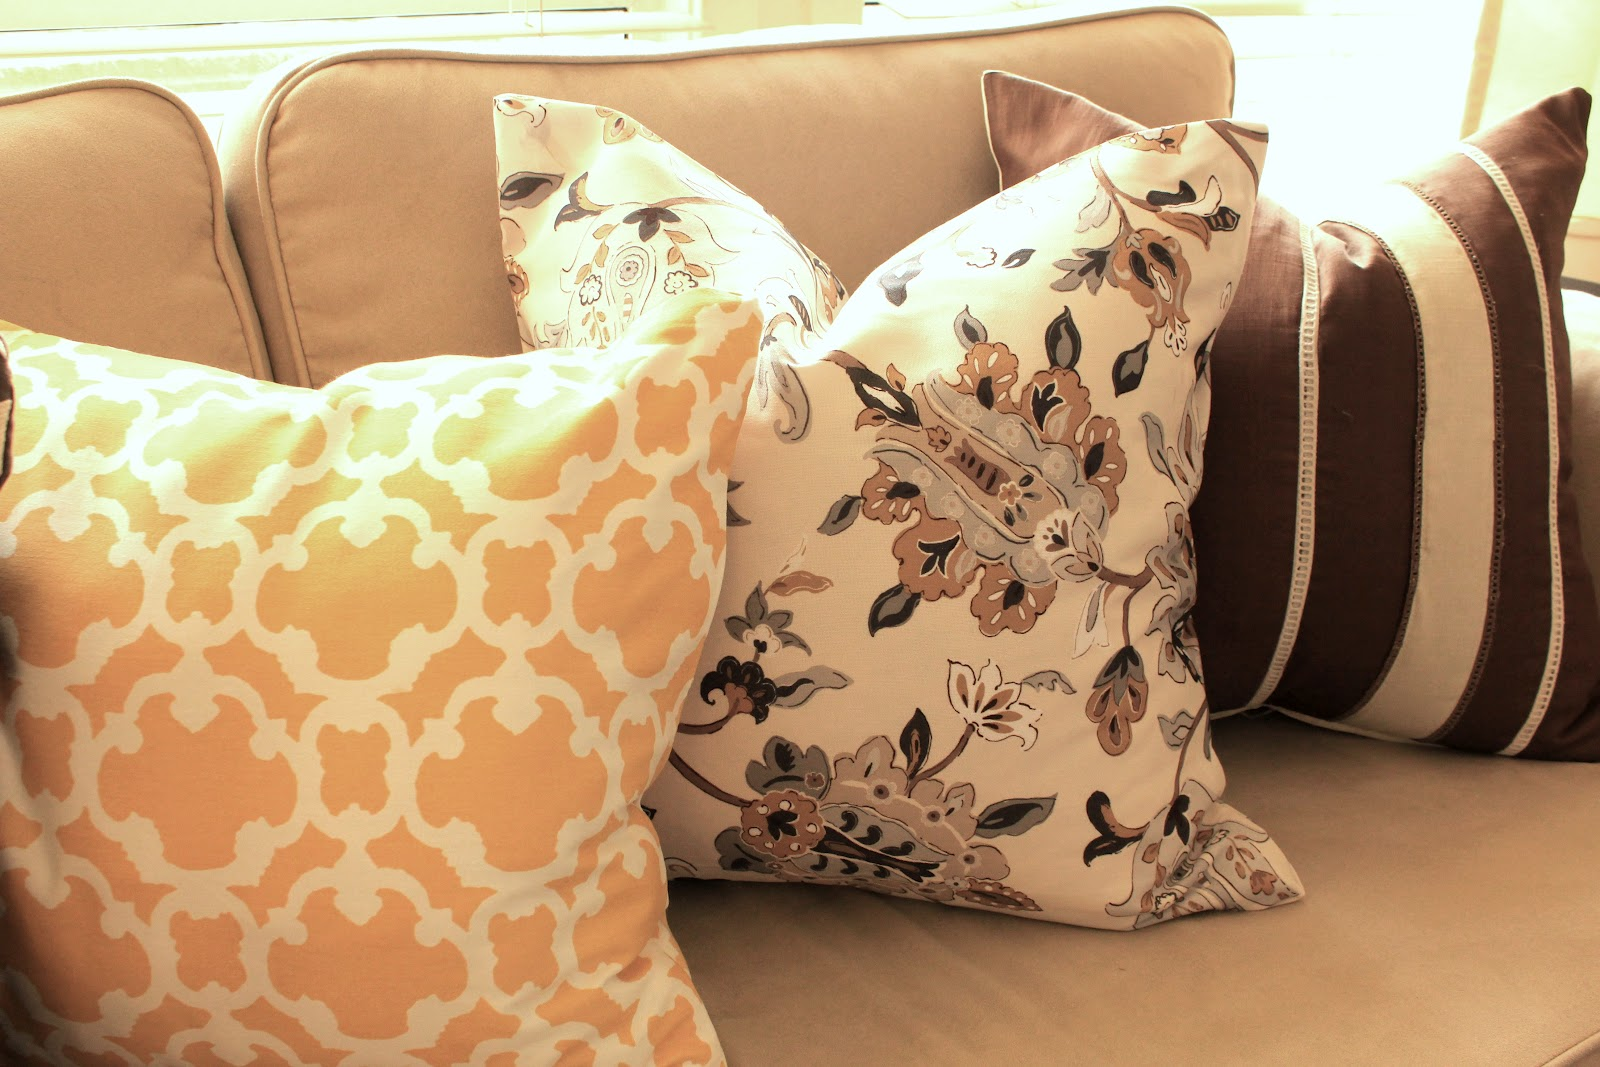 Cup Half Full: DIY - No Sew Throw Pillows